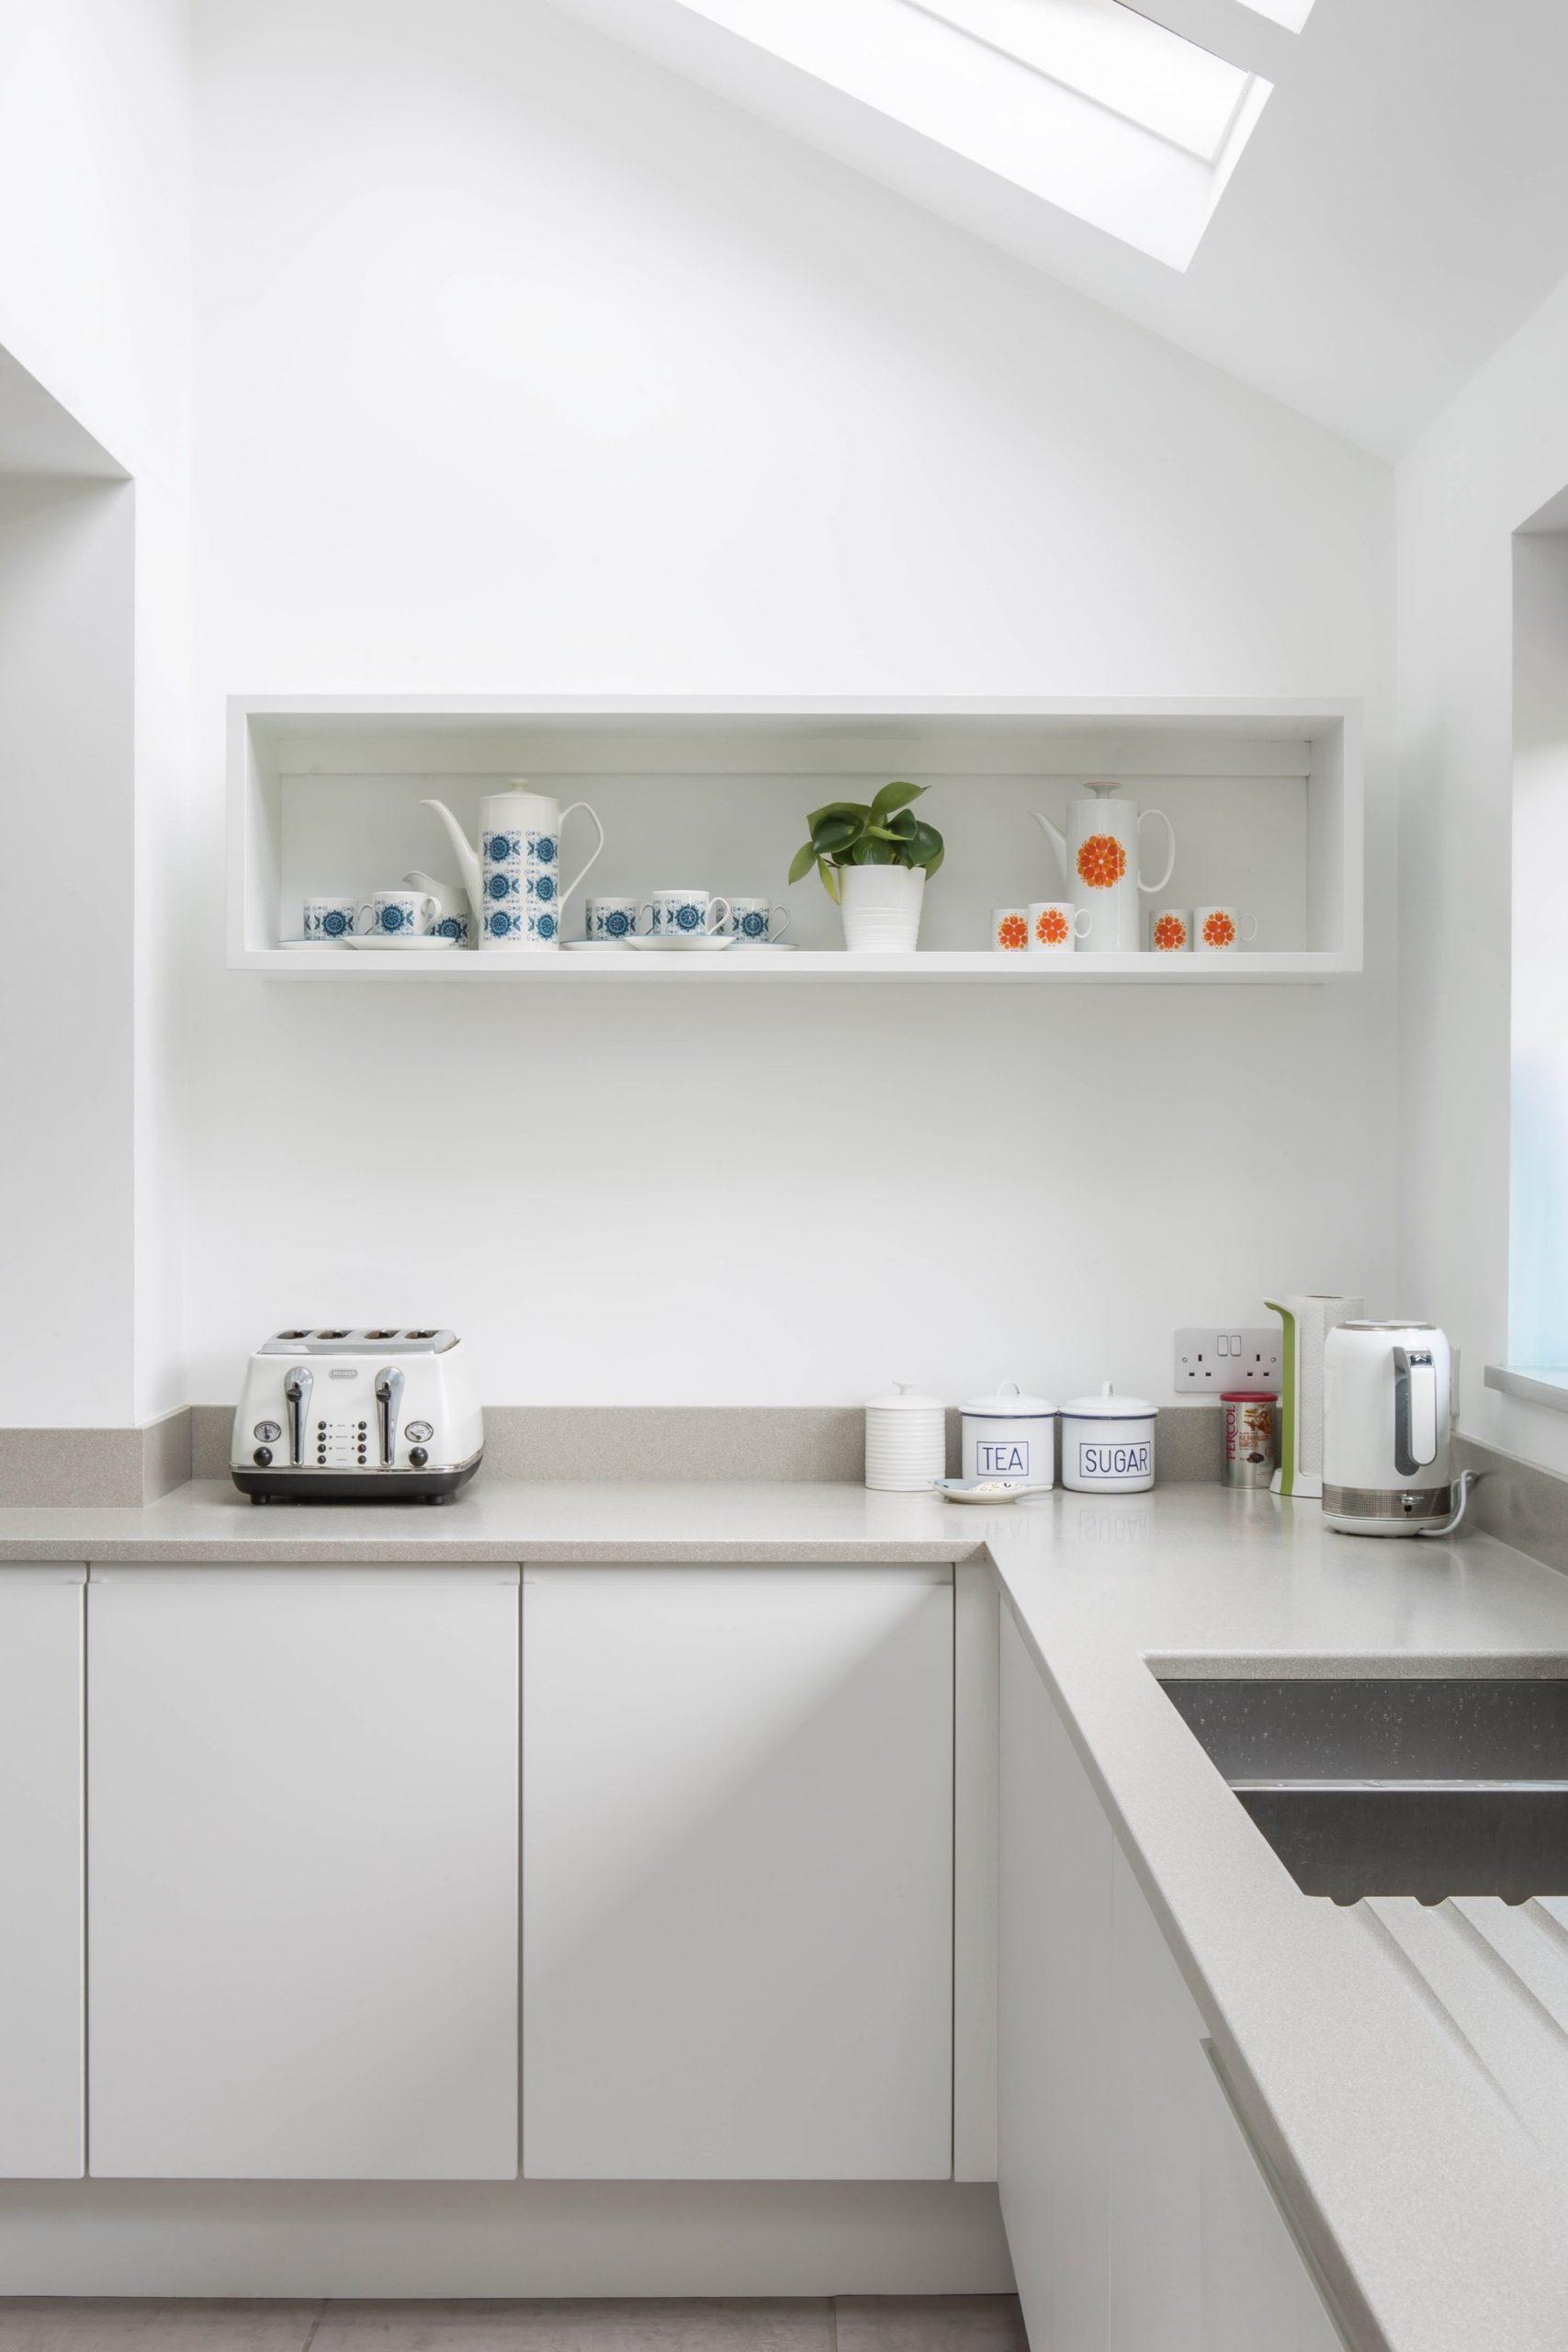 White kitchen grey worktops painted box shelf aylesbury buckinghamshire scaled